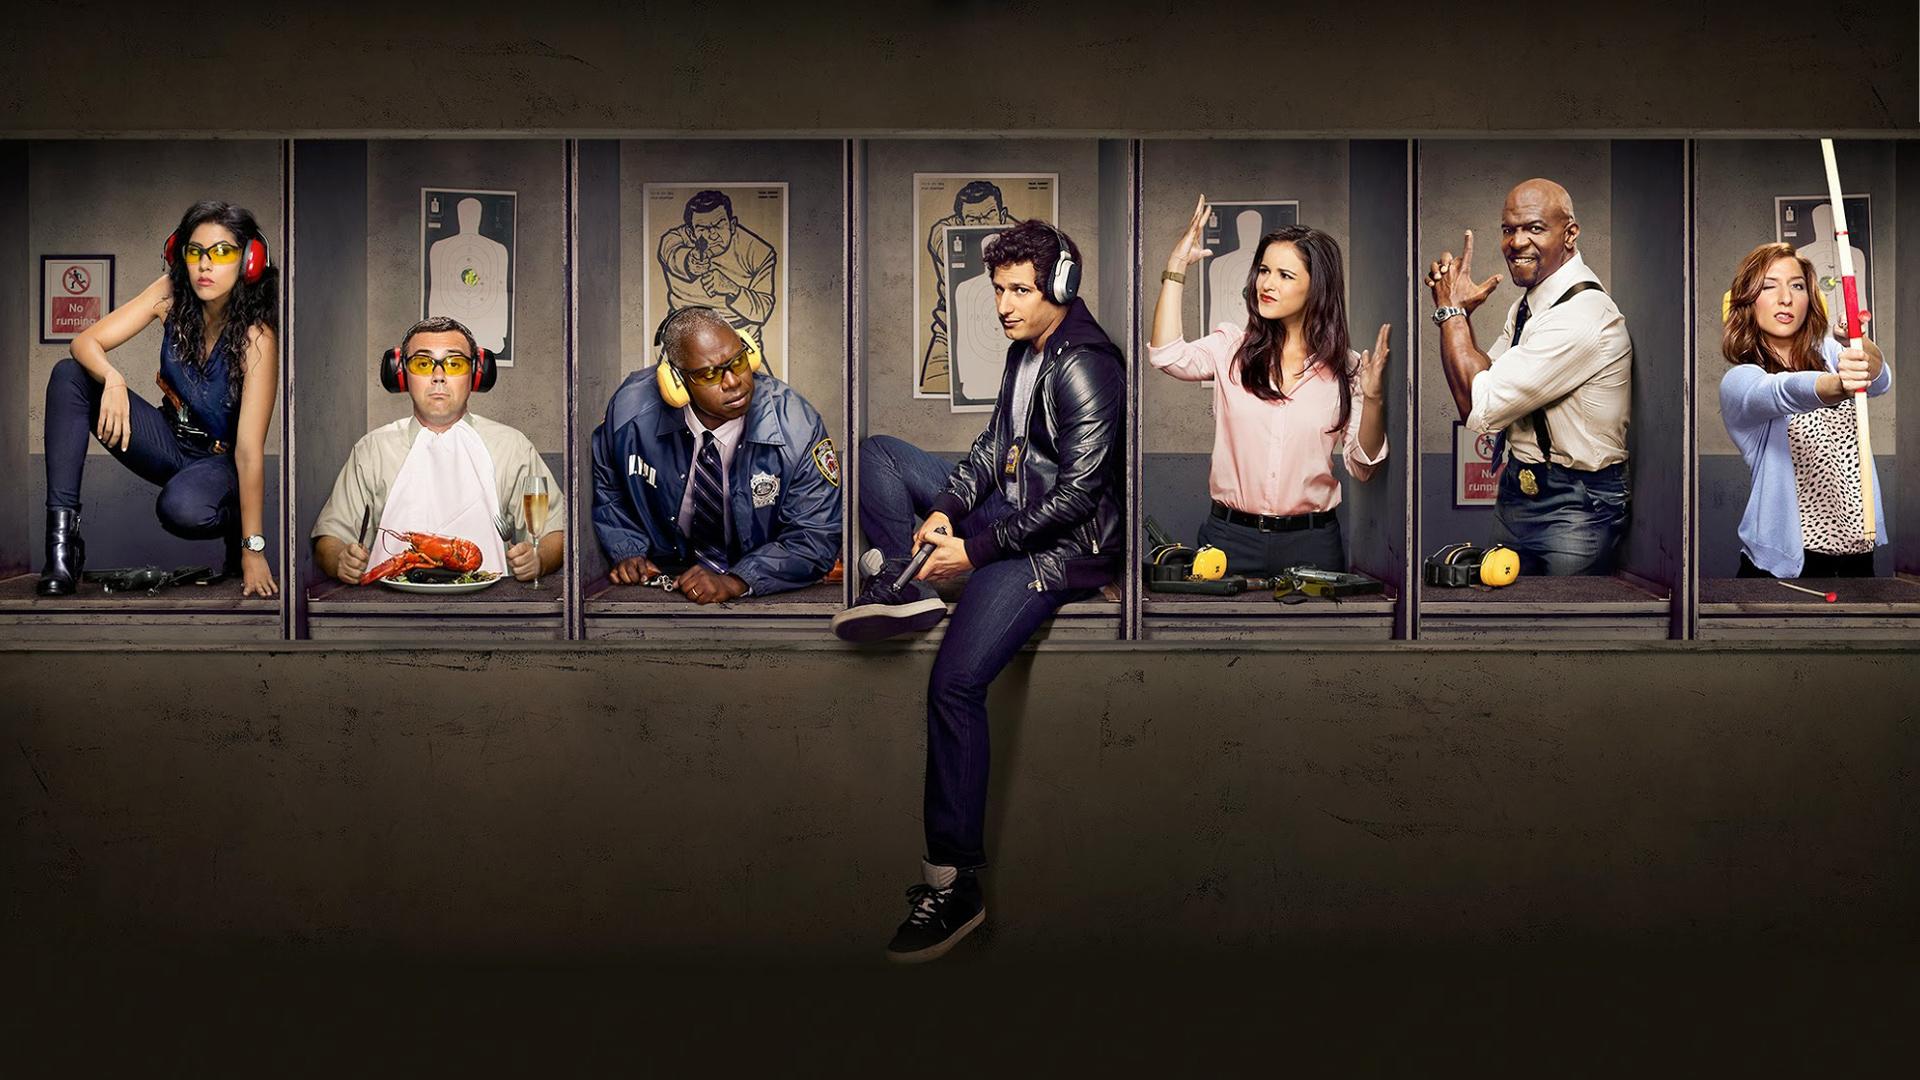 FOX bestelt compleet seizoen van Brooklyn Nine-Nine